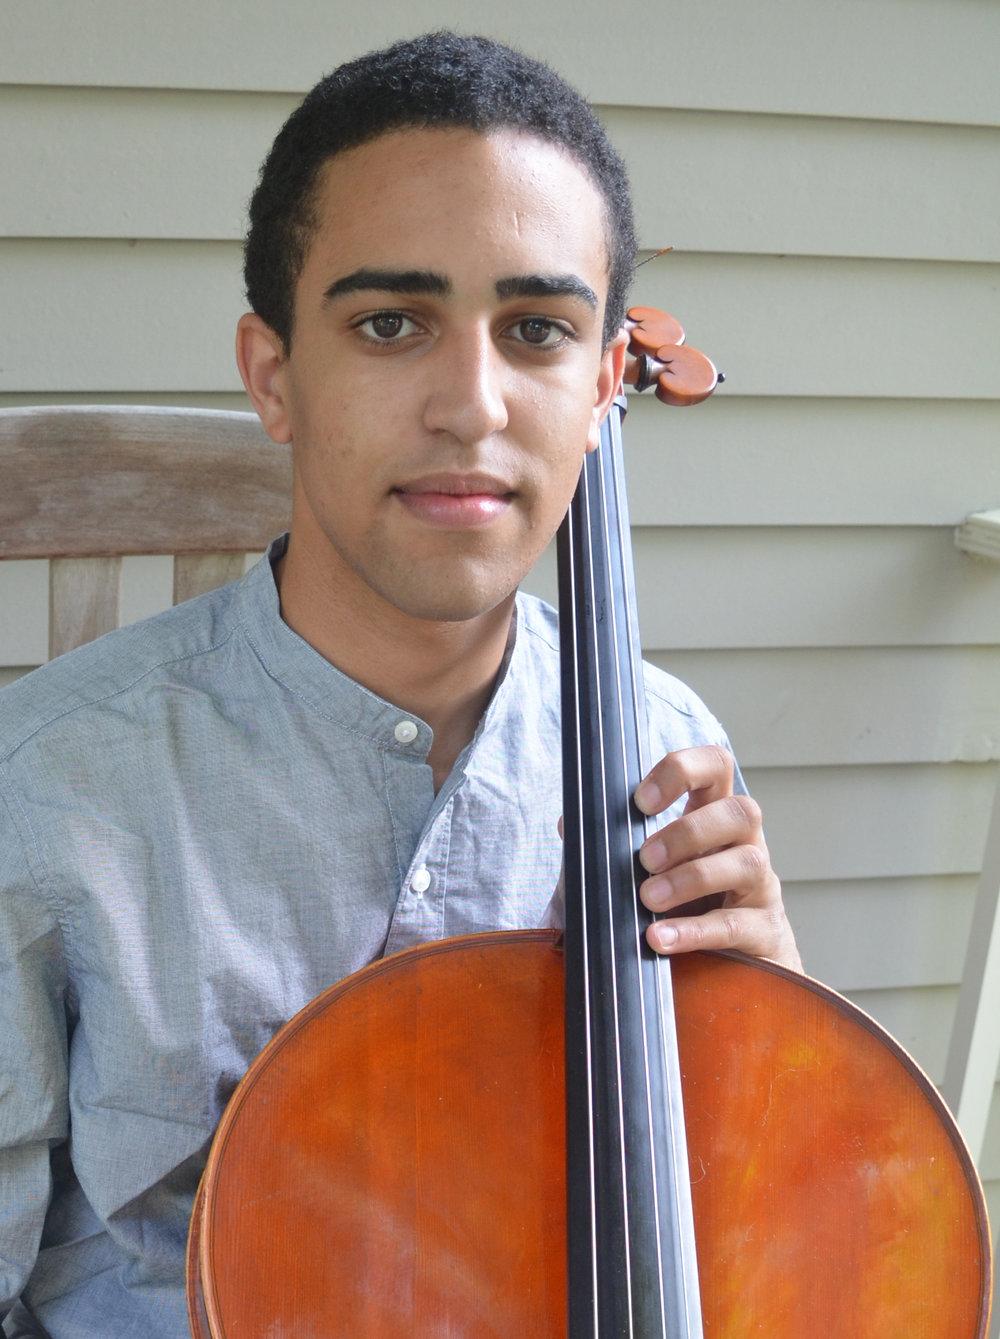 Cellist Lev Mamuya